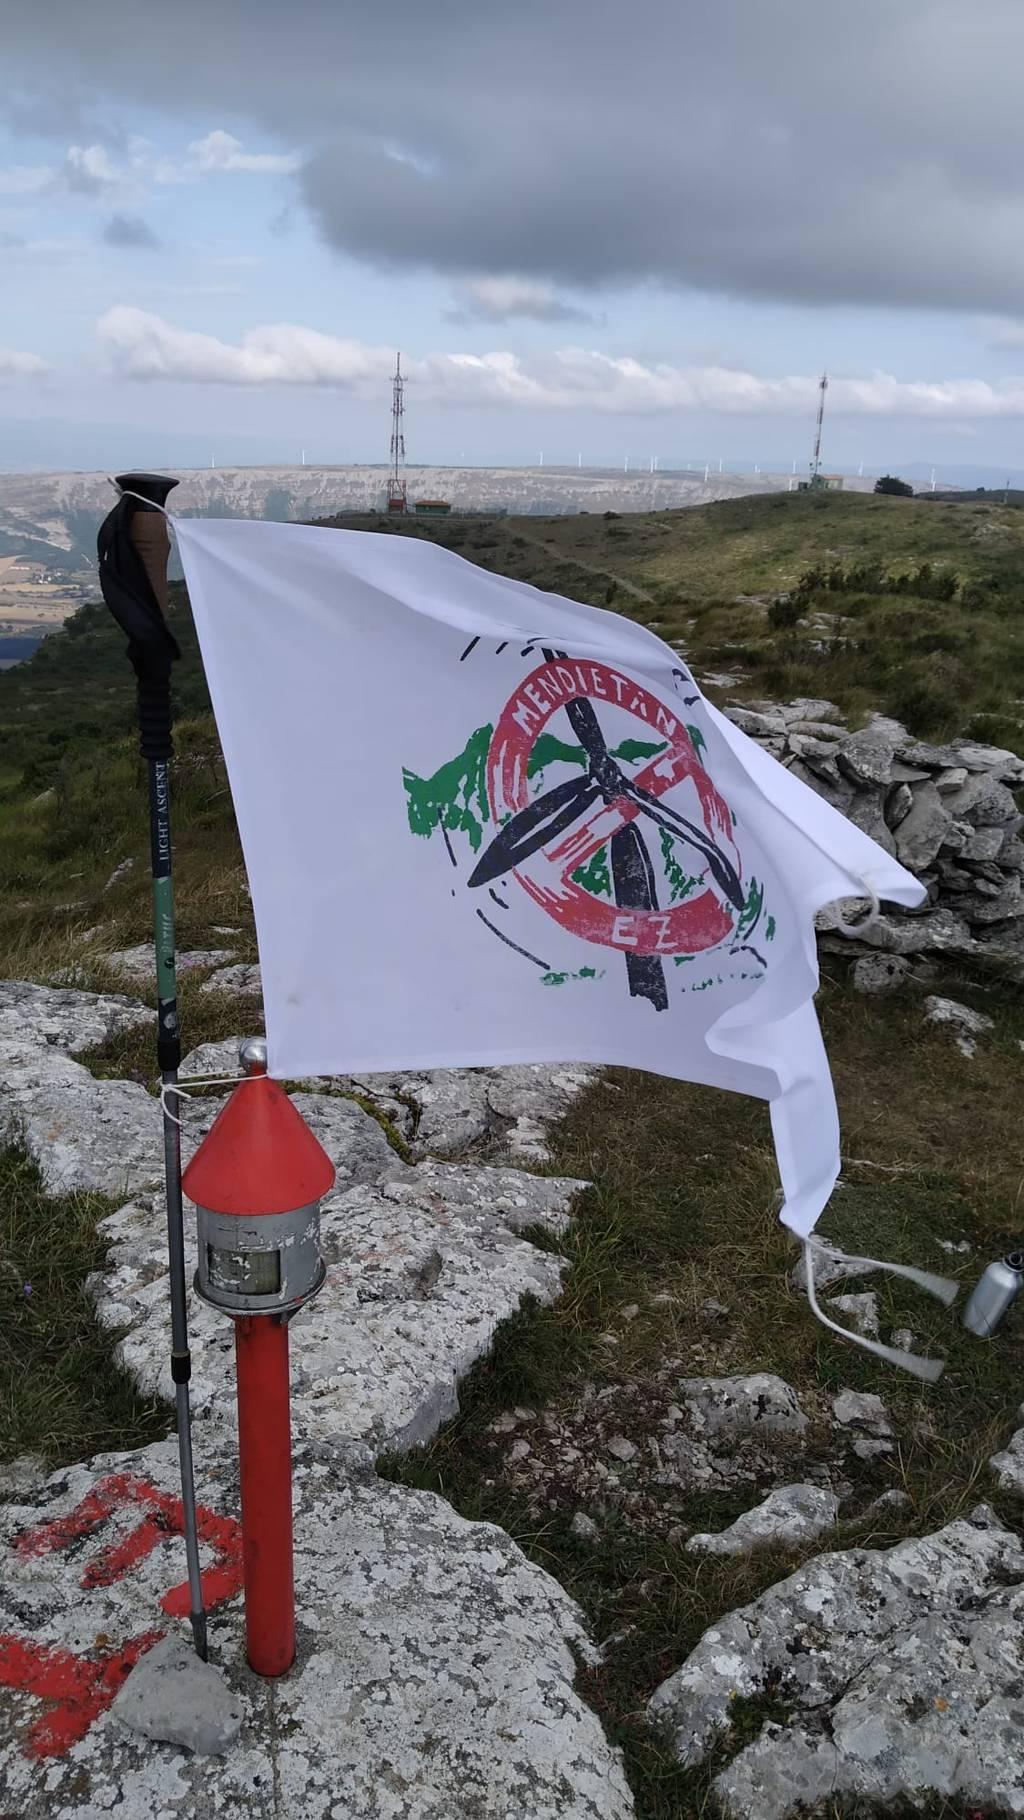 AneeeAM erabiltzailea Montemayor puntan, 2021-08-02 19:10